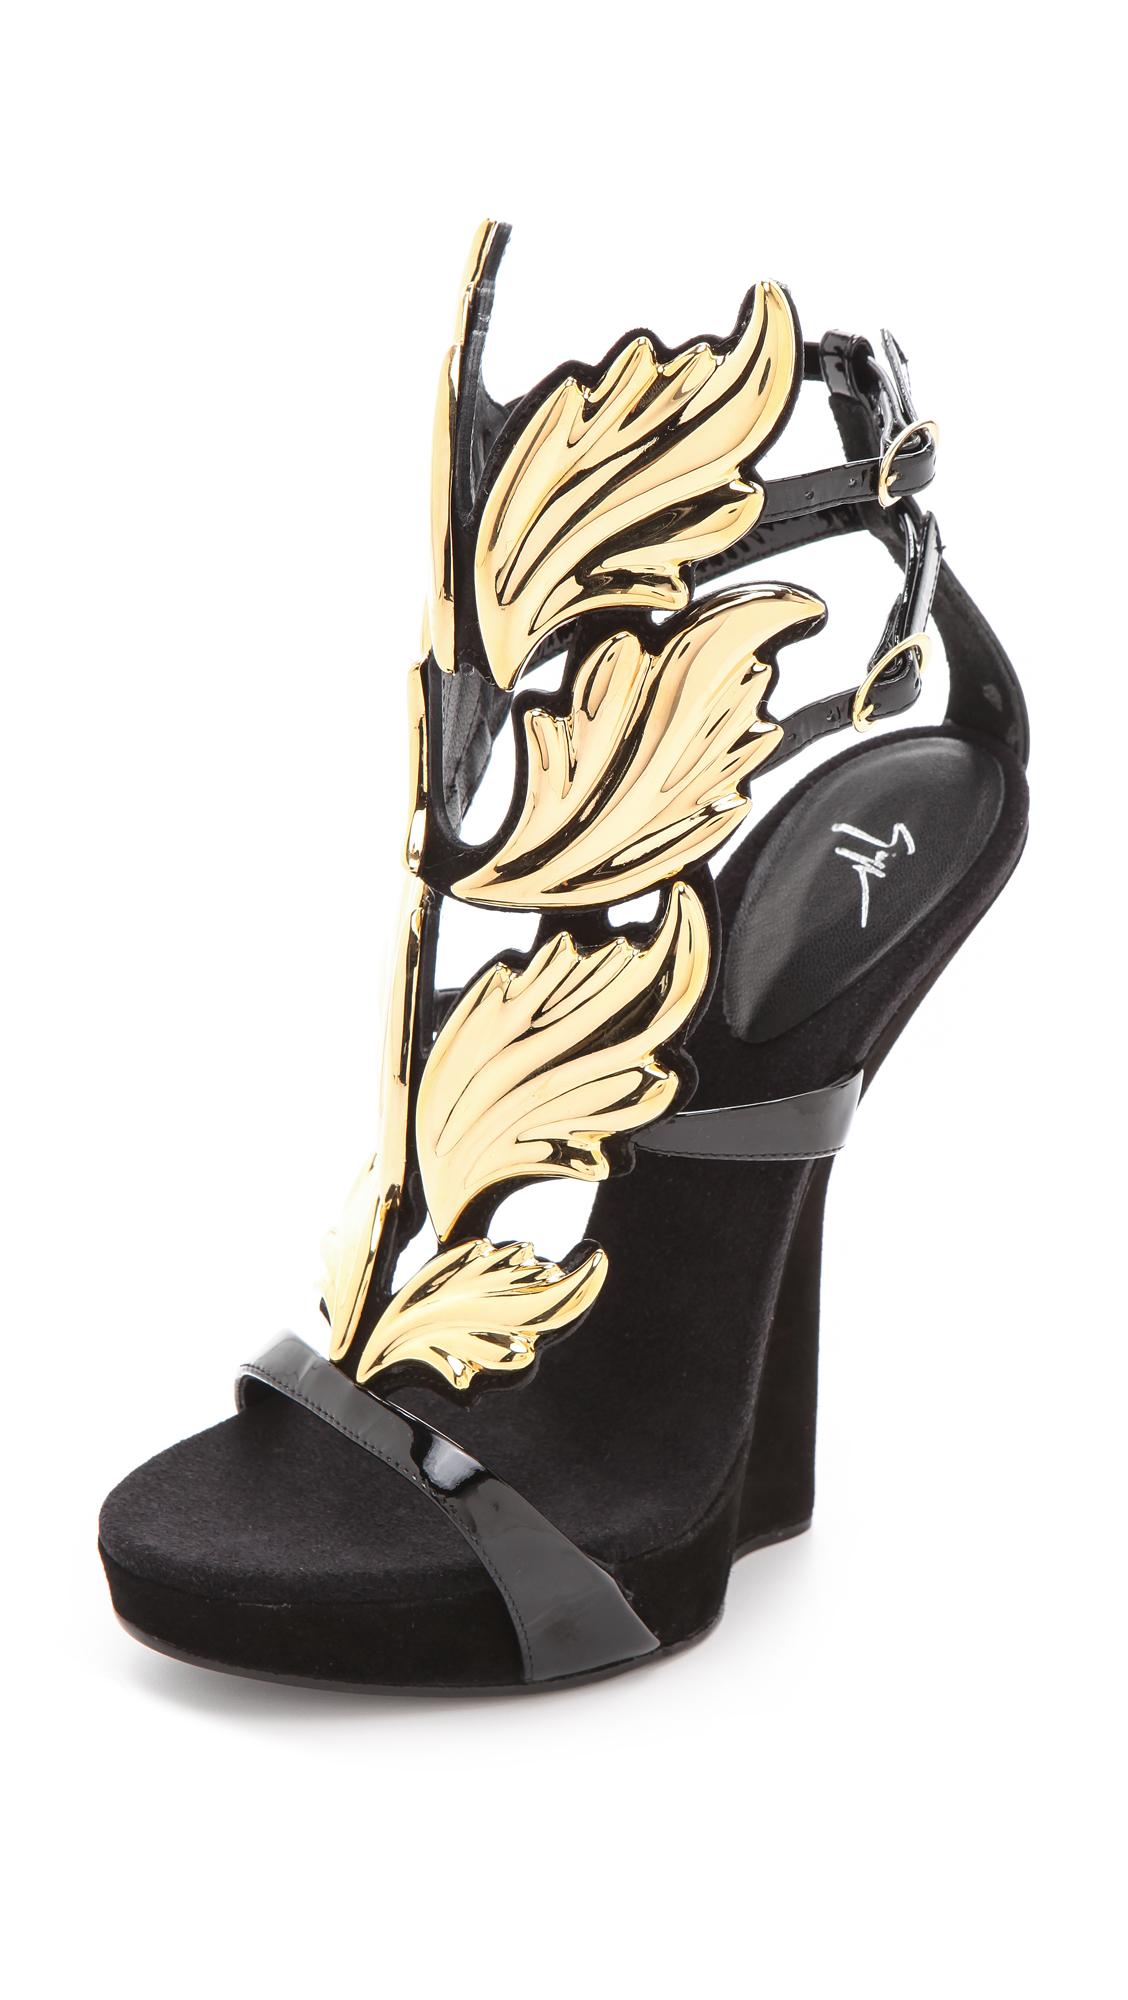 e6eec3e846473 Giuseppe Zanotti Baroque Leaf Sandals | SHOPBOP